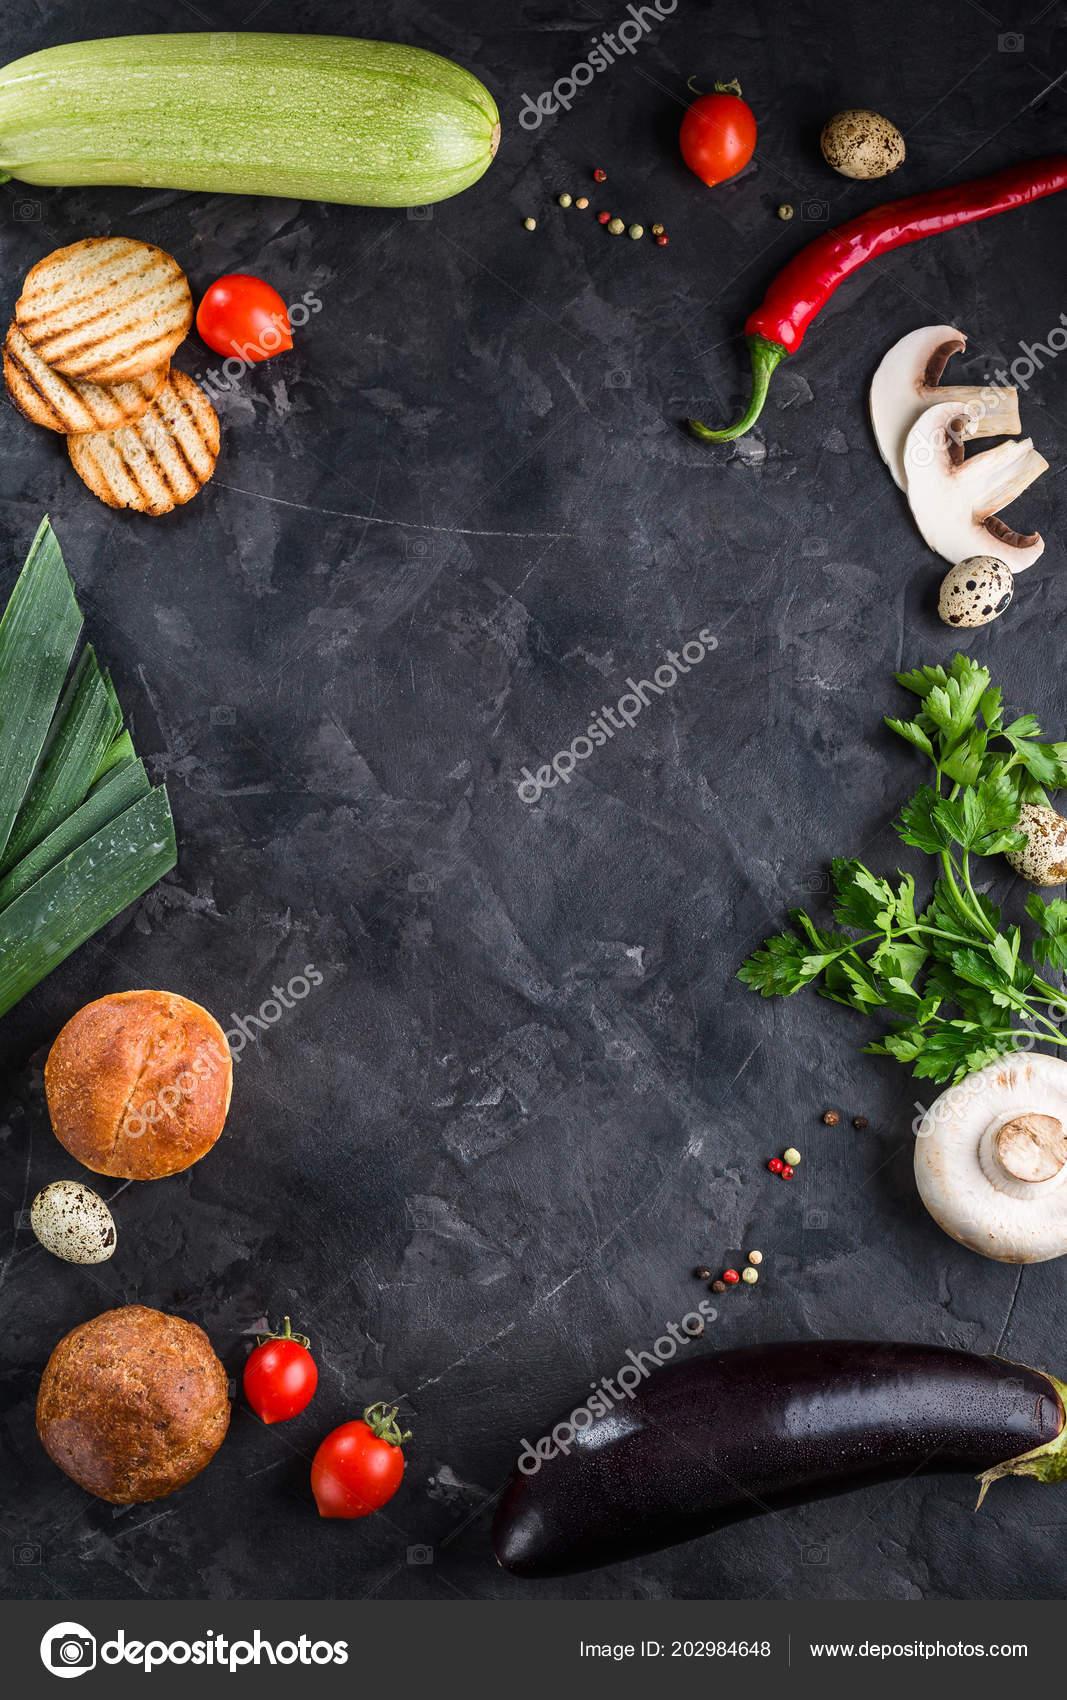 Rama Food Menu Restaurant Black Background Ingredients Space Copy Concept Stock Photo C Yakovlevadaria 202984648